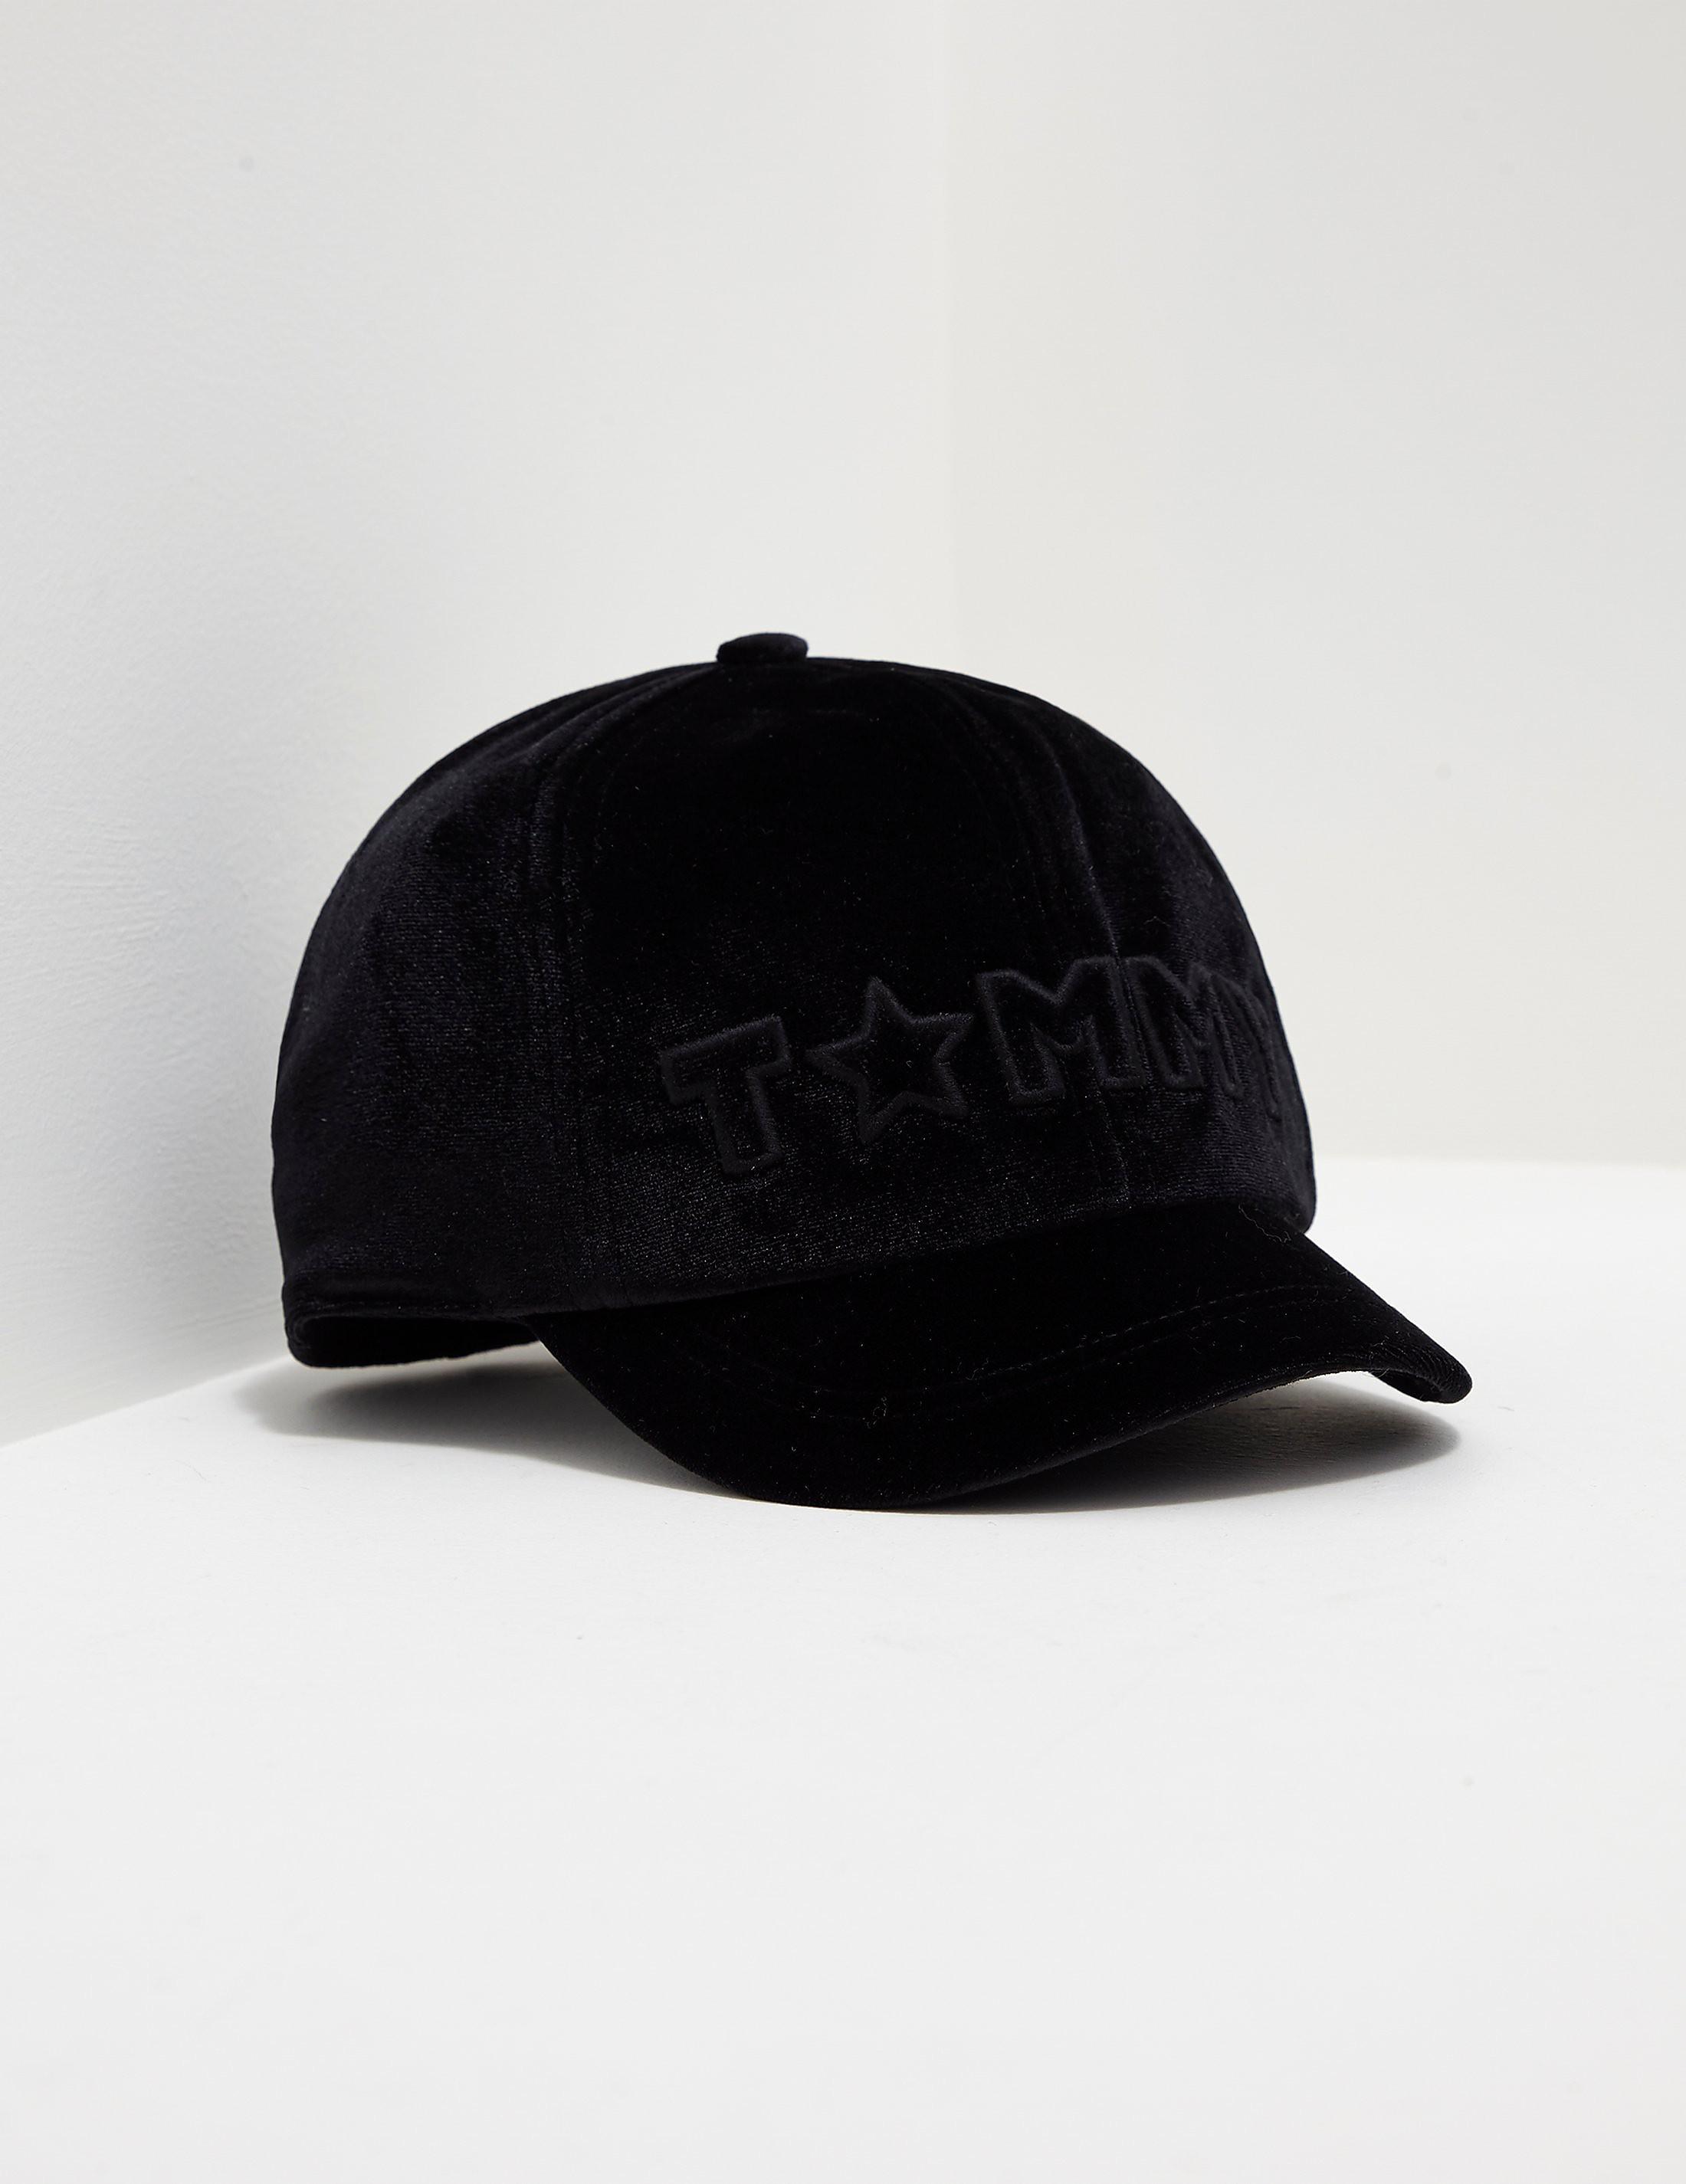 Tommy Hilfiger Velvet Cap